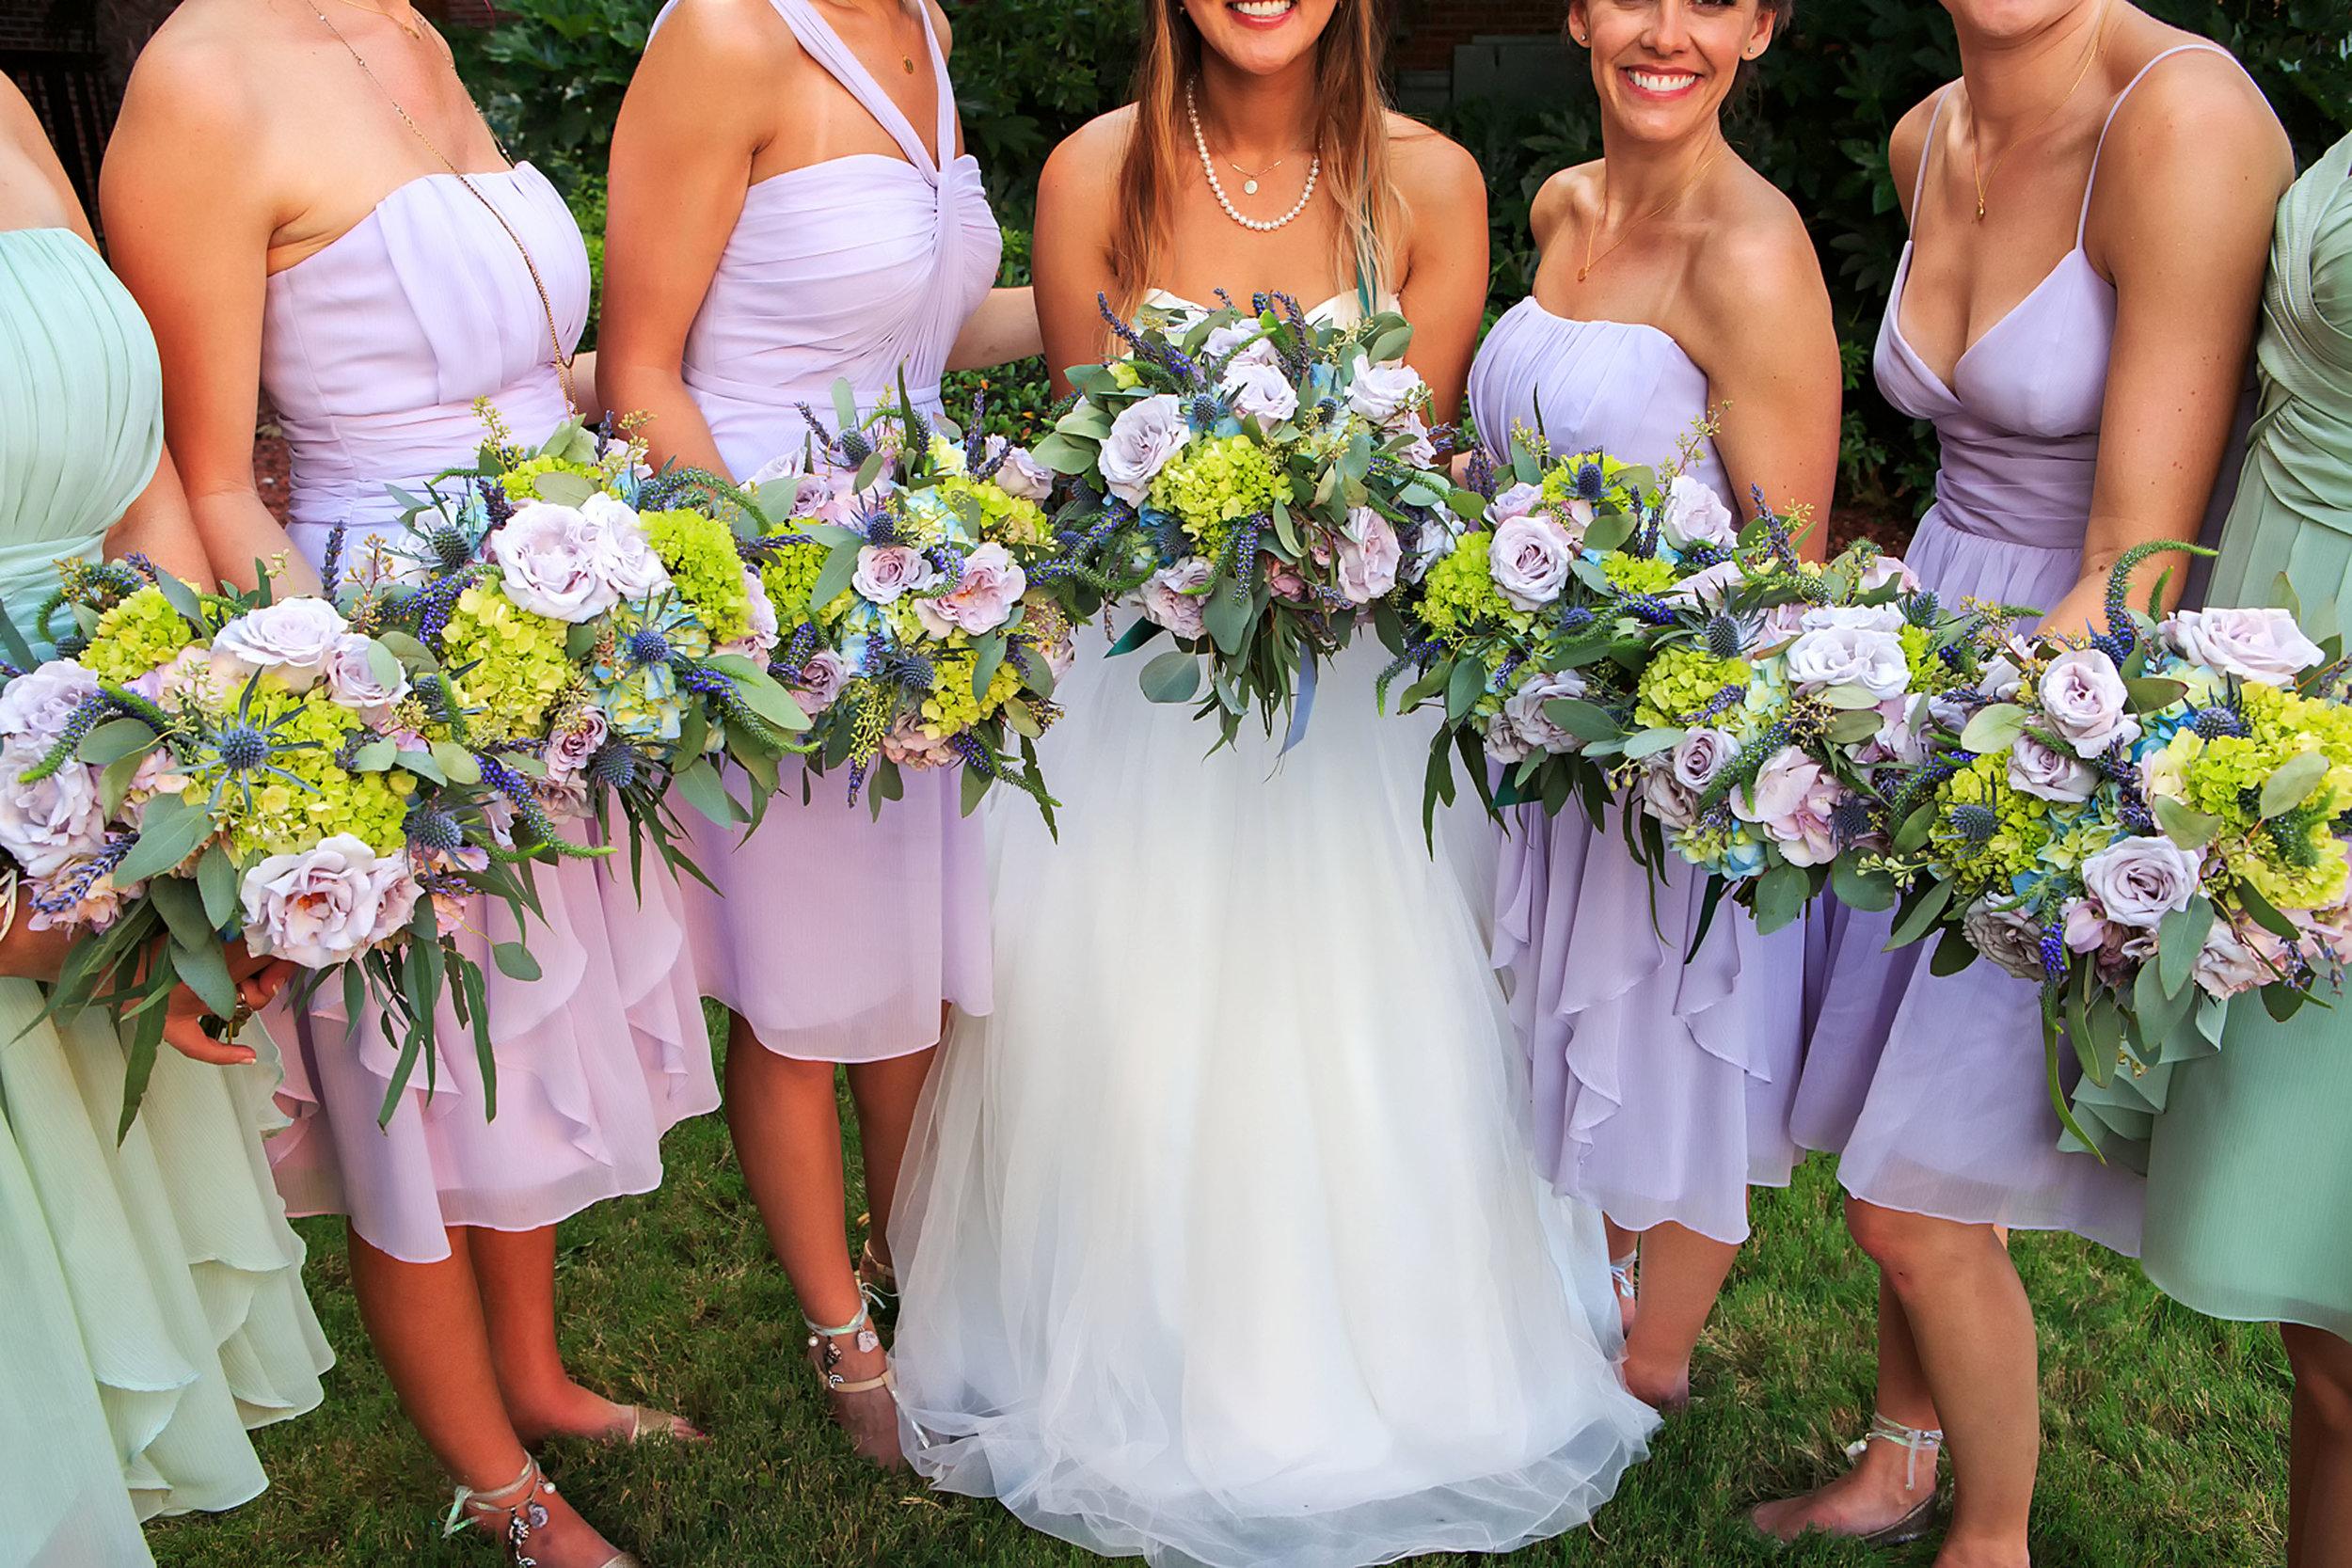 North_Carolina_Wedding_Photographer_Tiffany_Abruzzo_Group_01.jpg